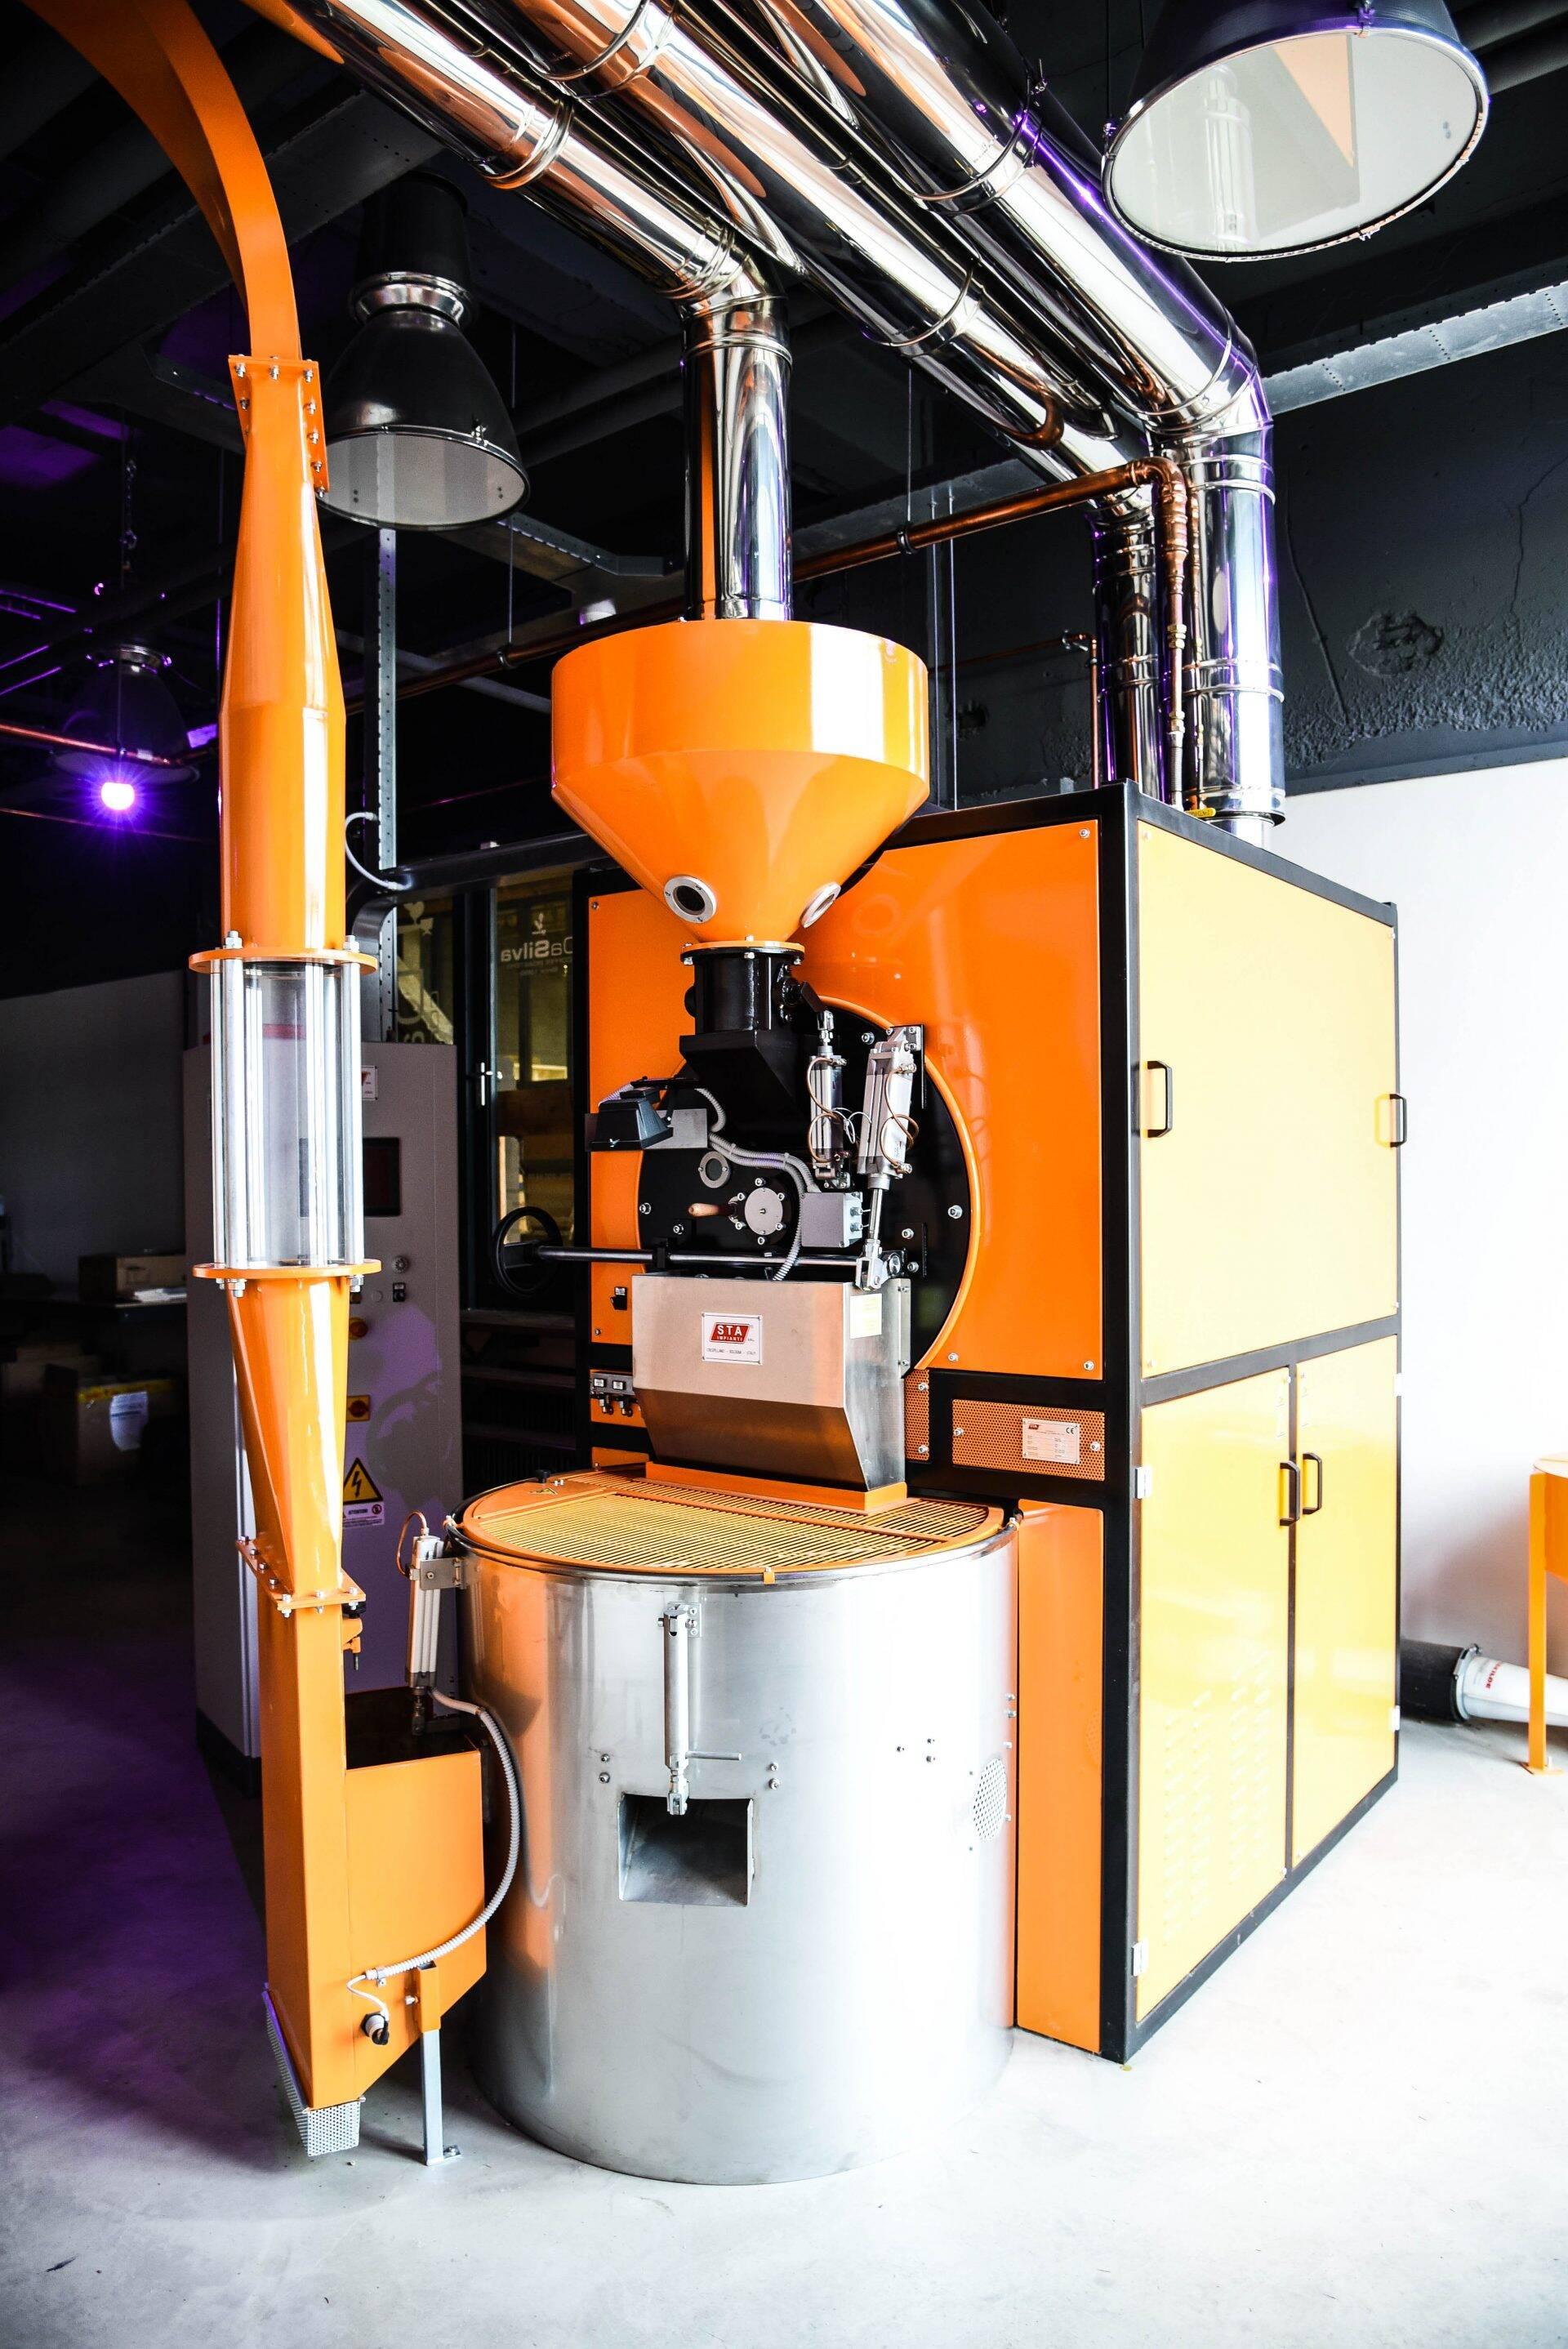 DaSilva Espressobar & Stadskoffiebranderij in 's-Hertogenbosch